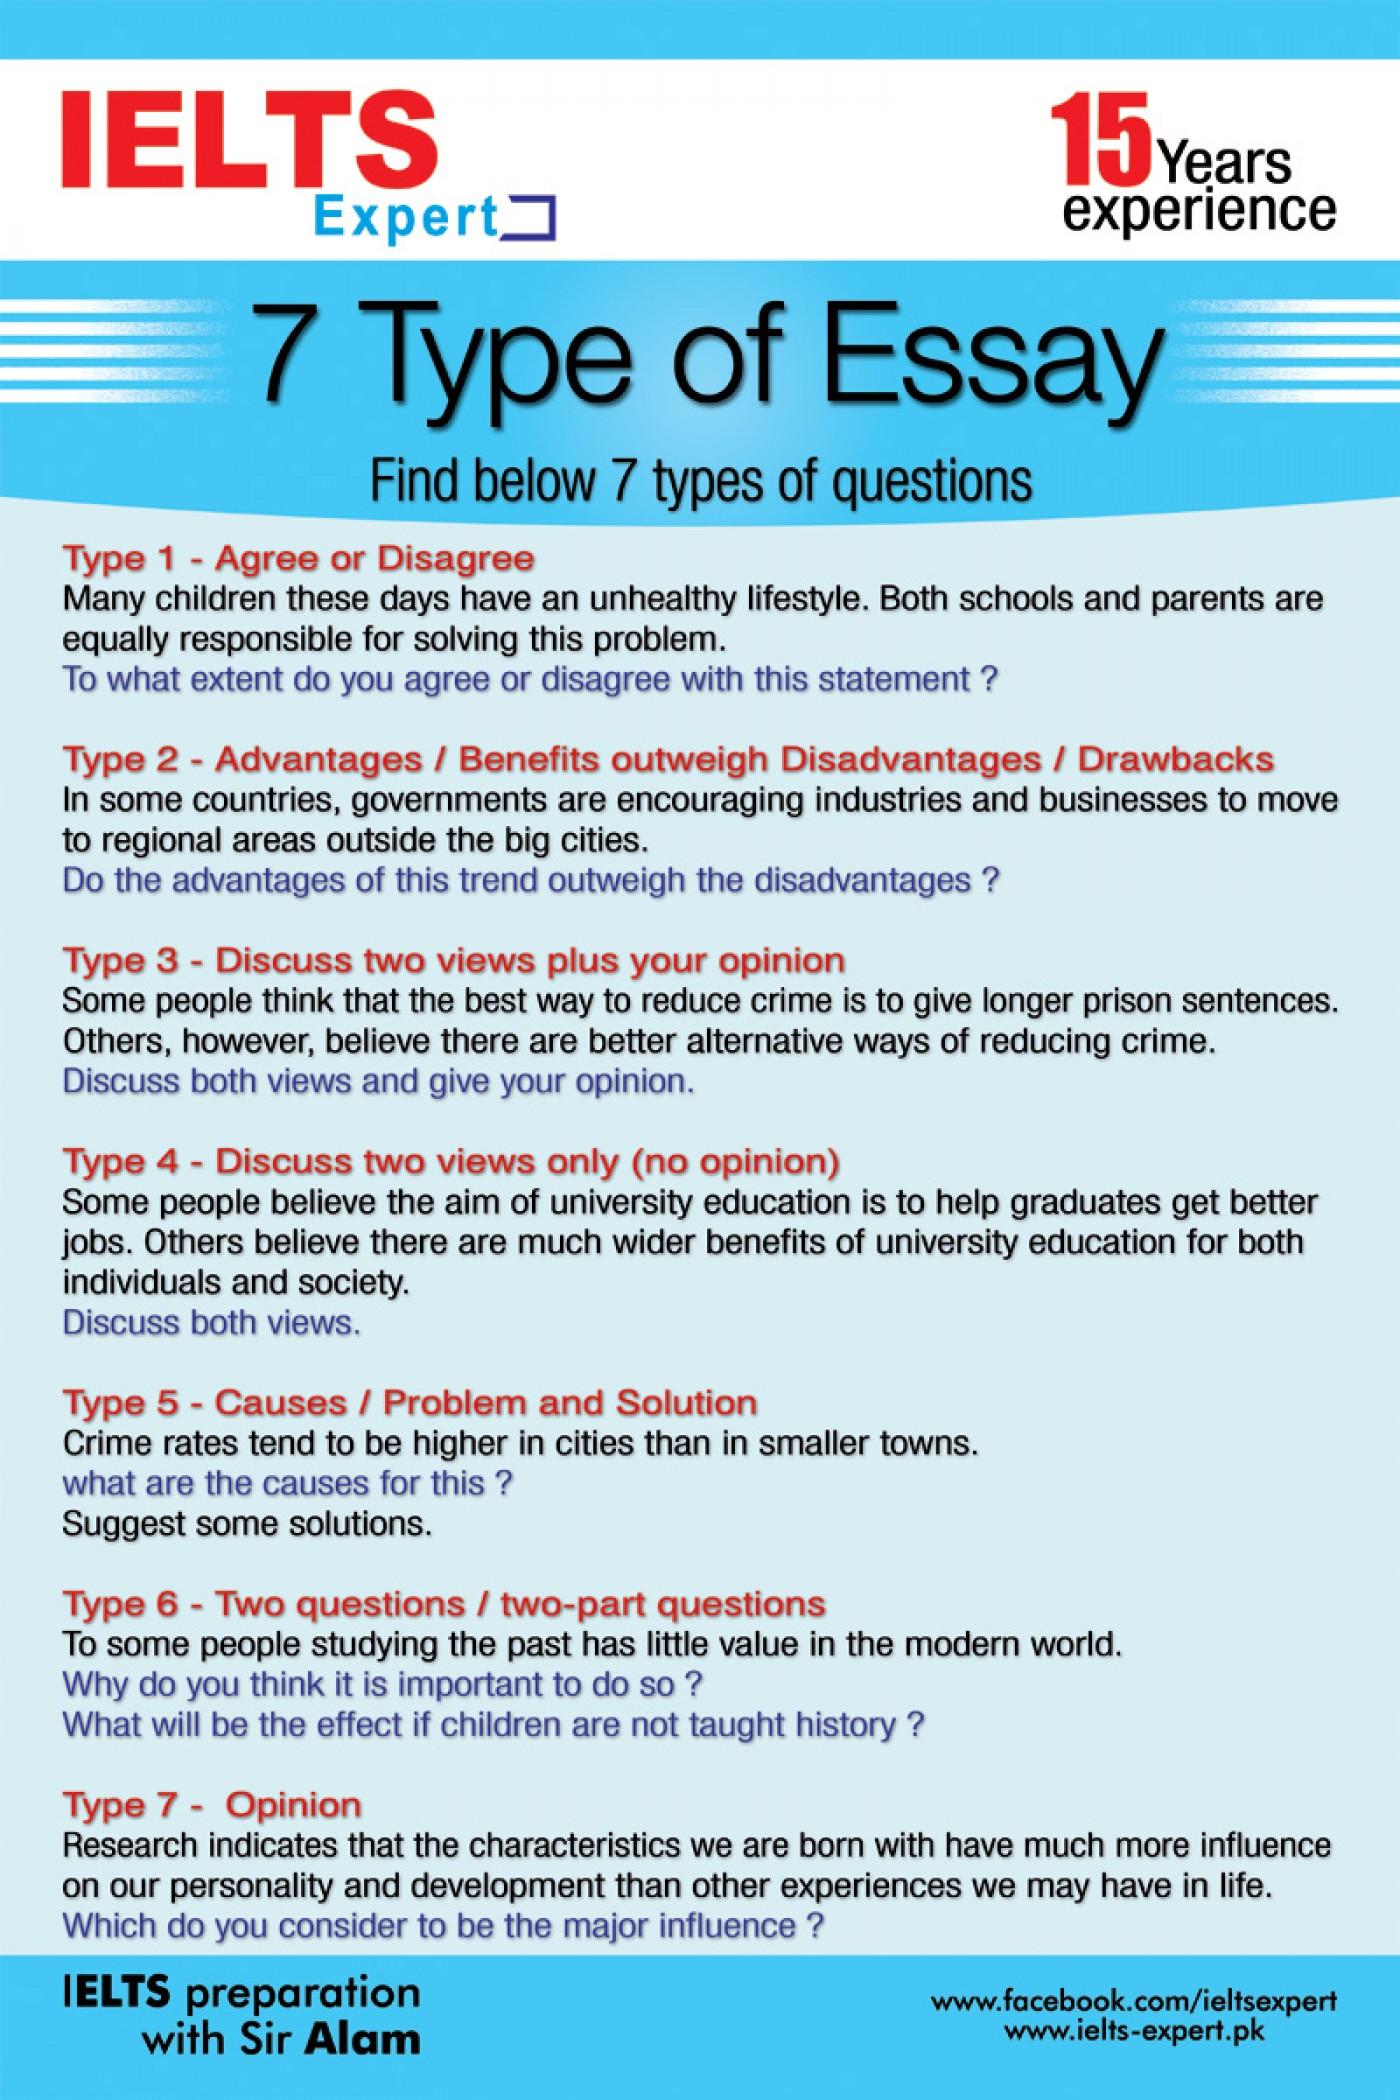 type of essays in ielts